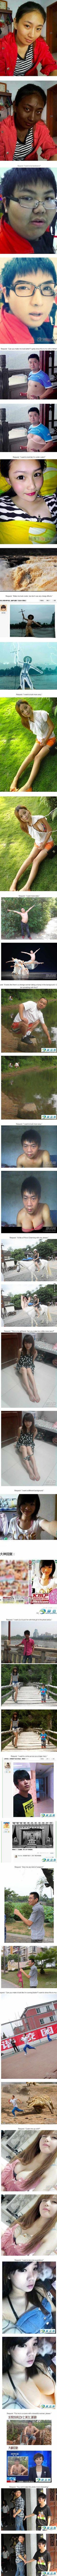 Chinese Photoshop Trolls.